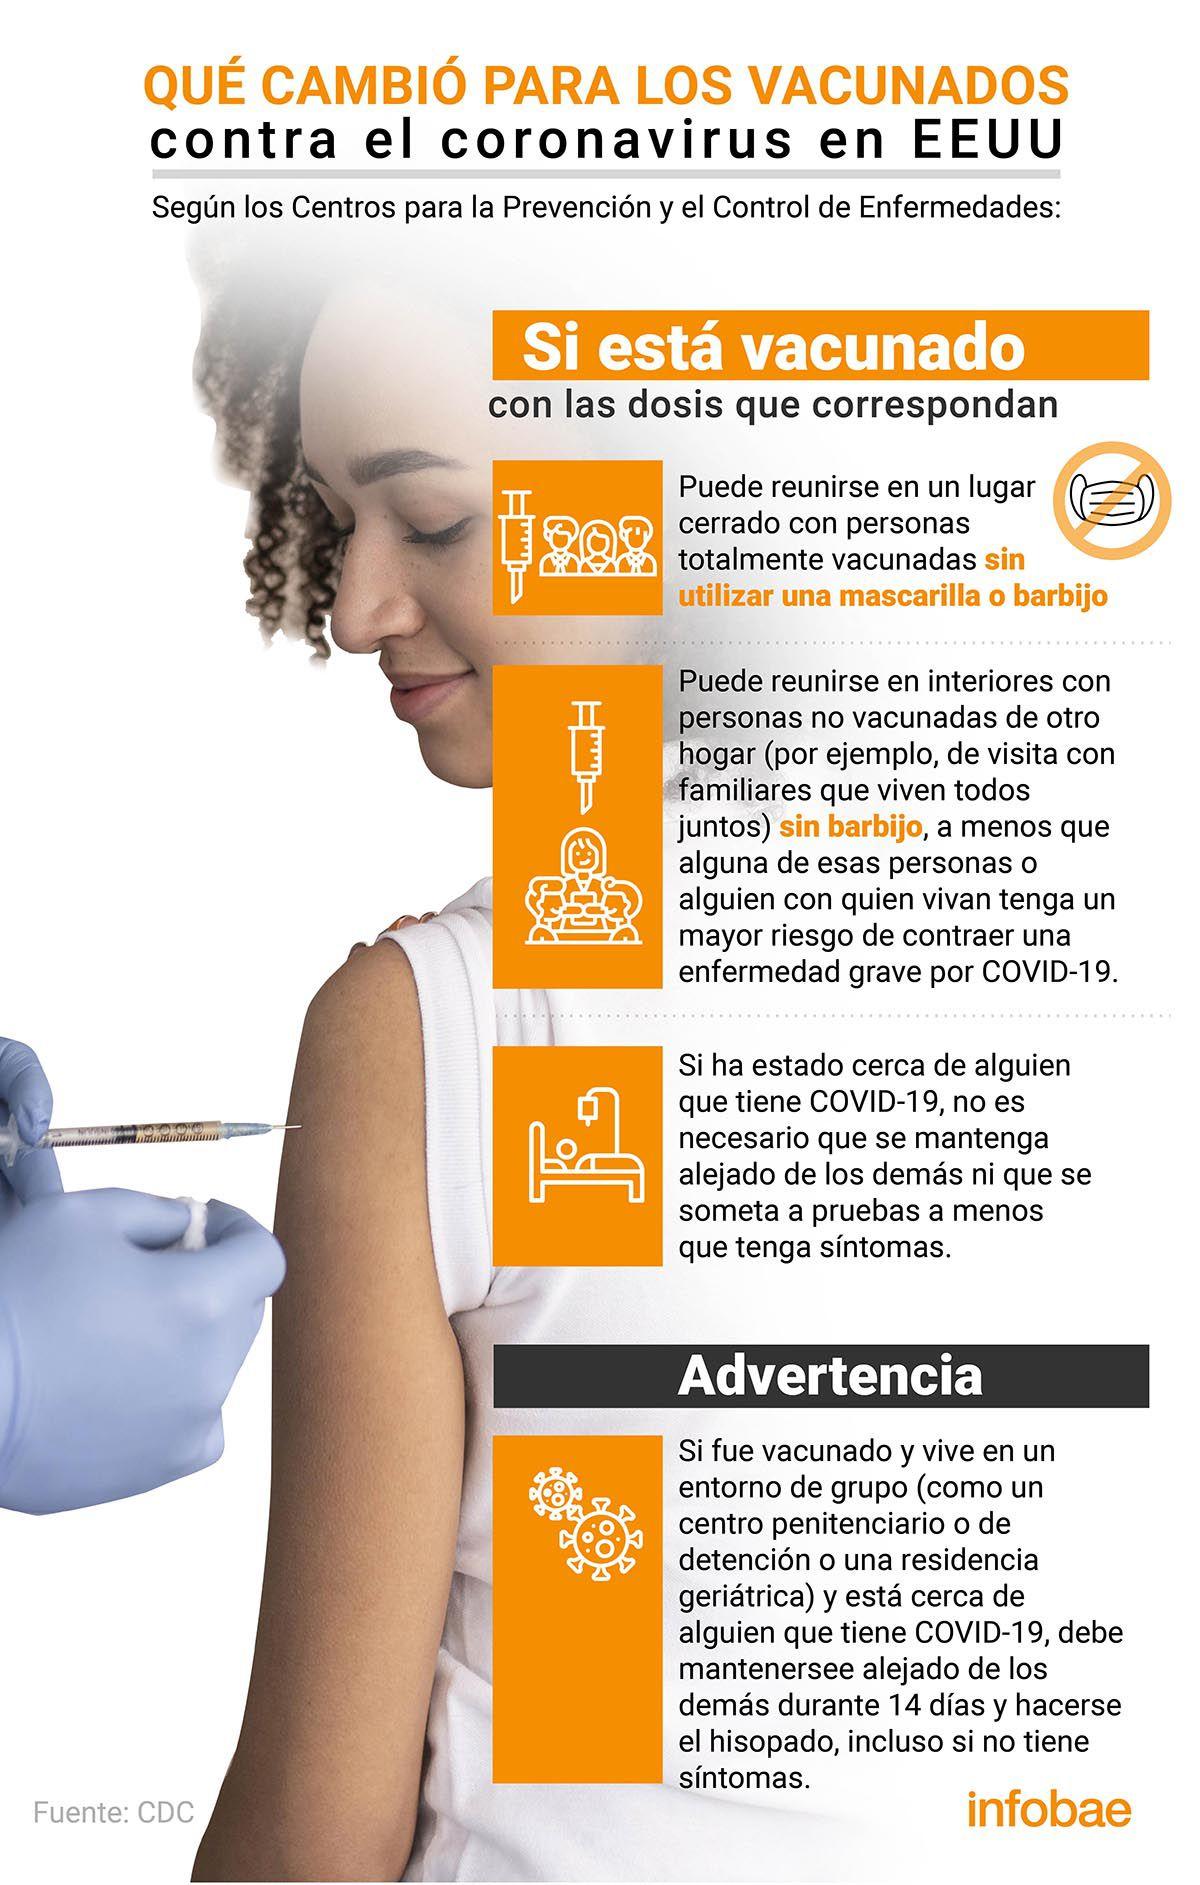 infografia vacunados eeuu